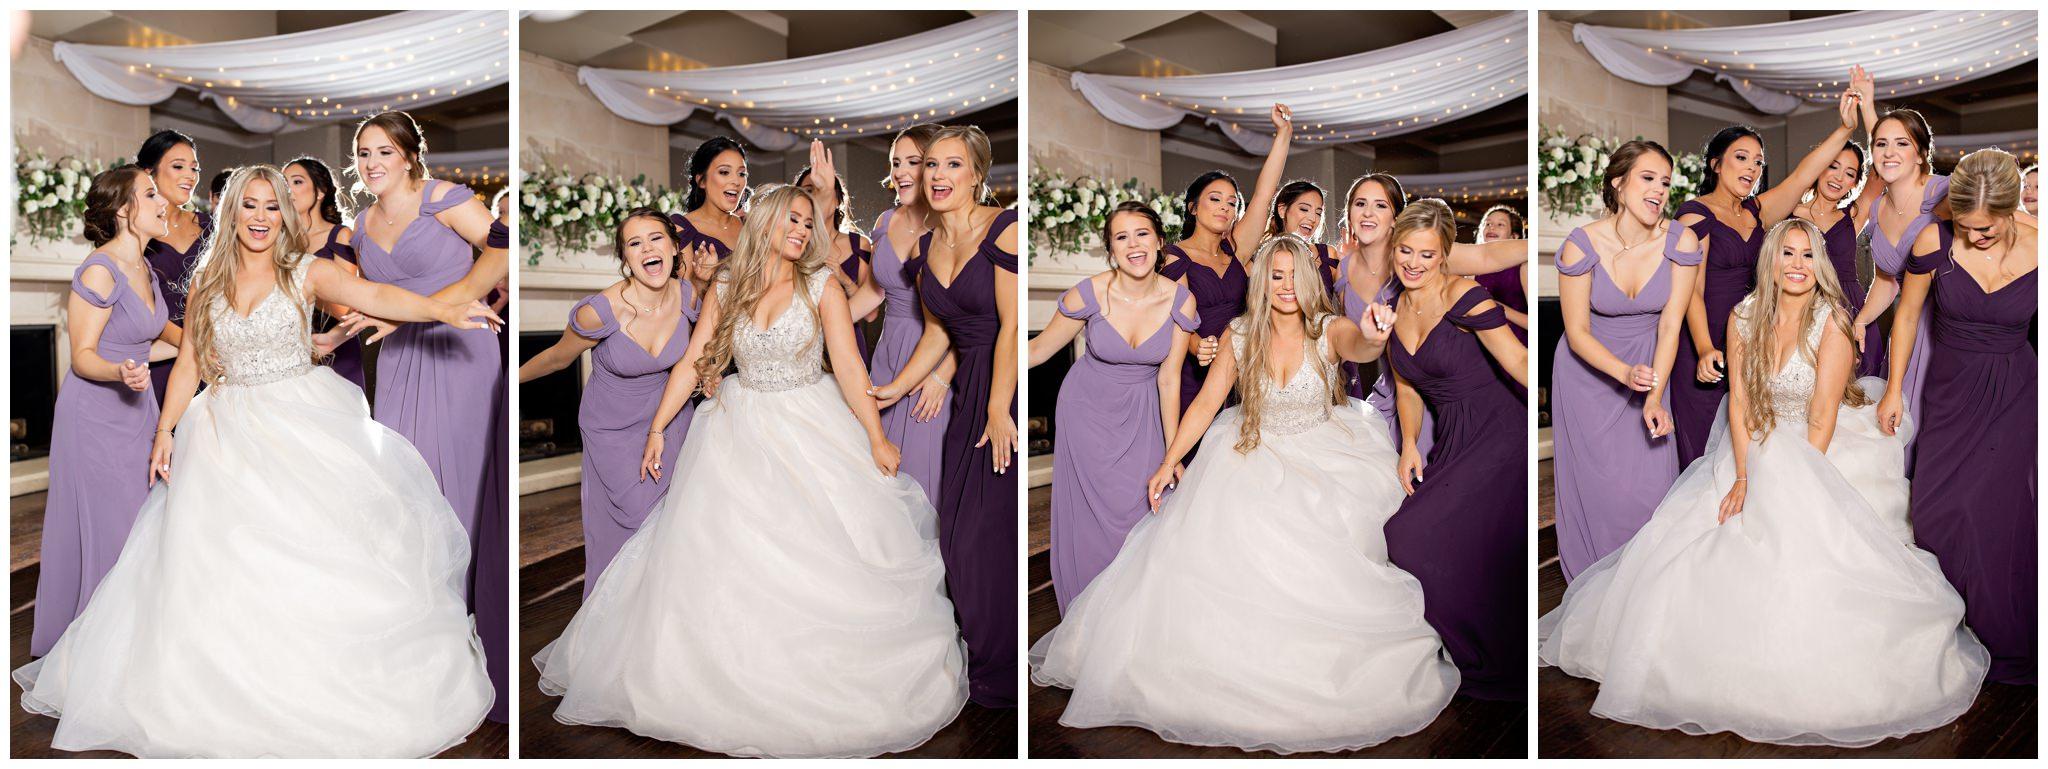 Bridesmaids dancing at wedding